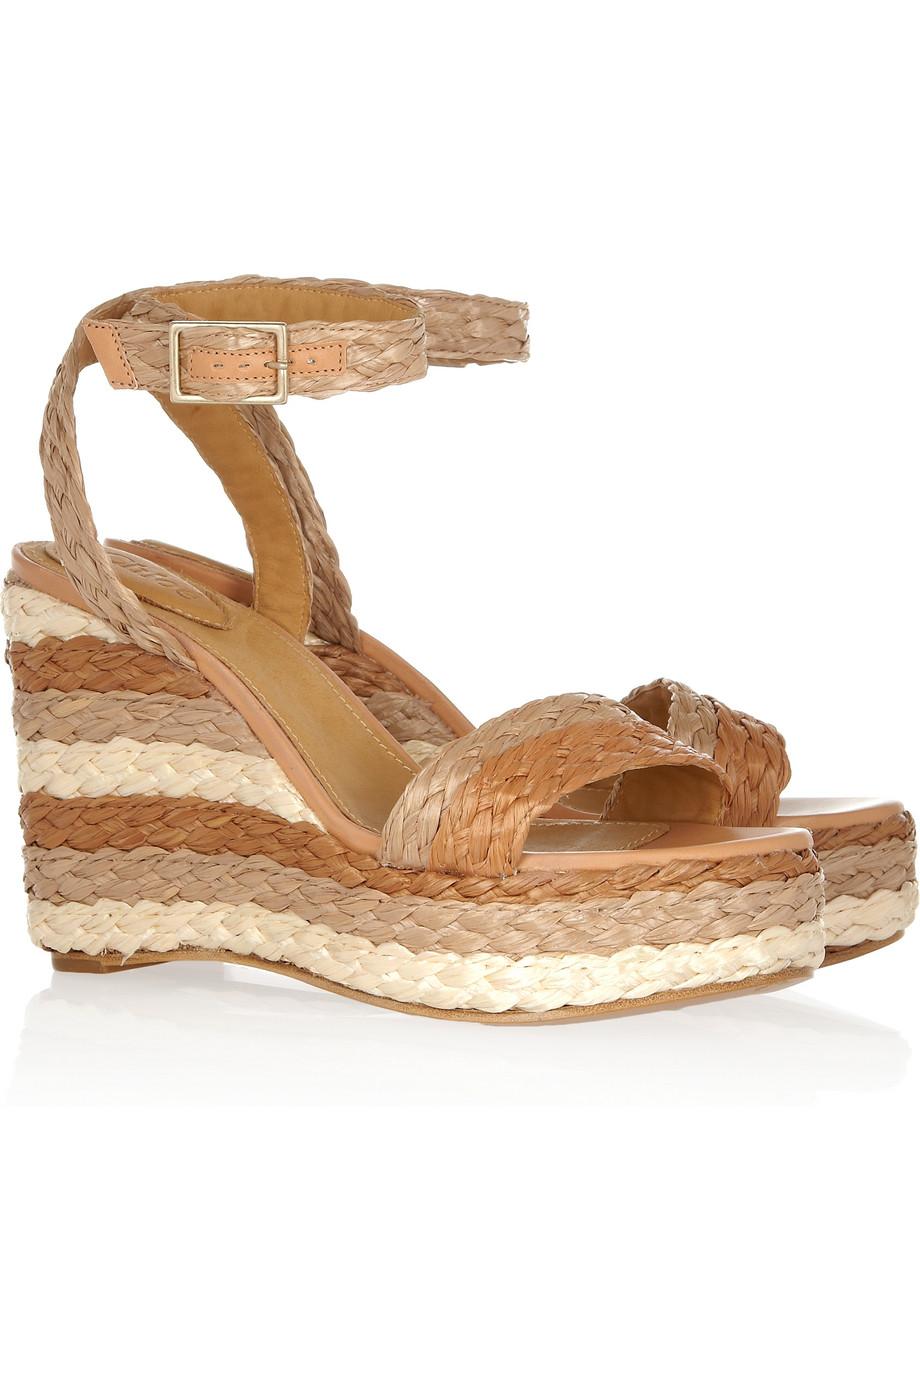 2a61f9d206d Chloé Brown Halter Ankle Raffia Wedge Sandal